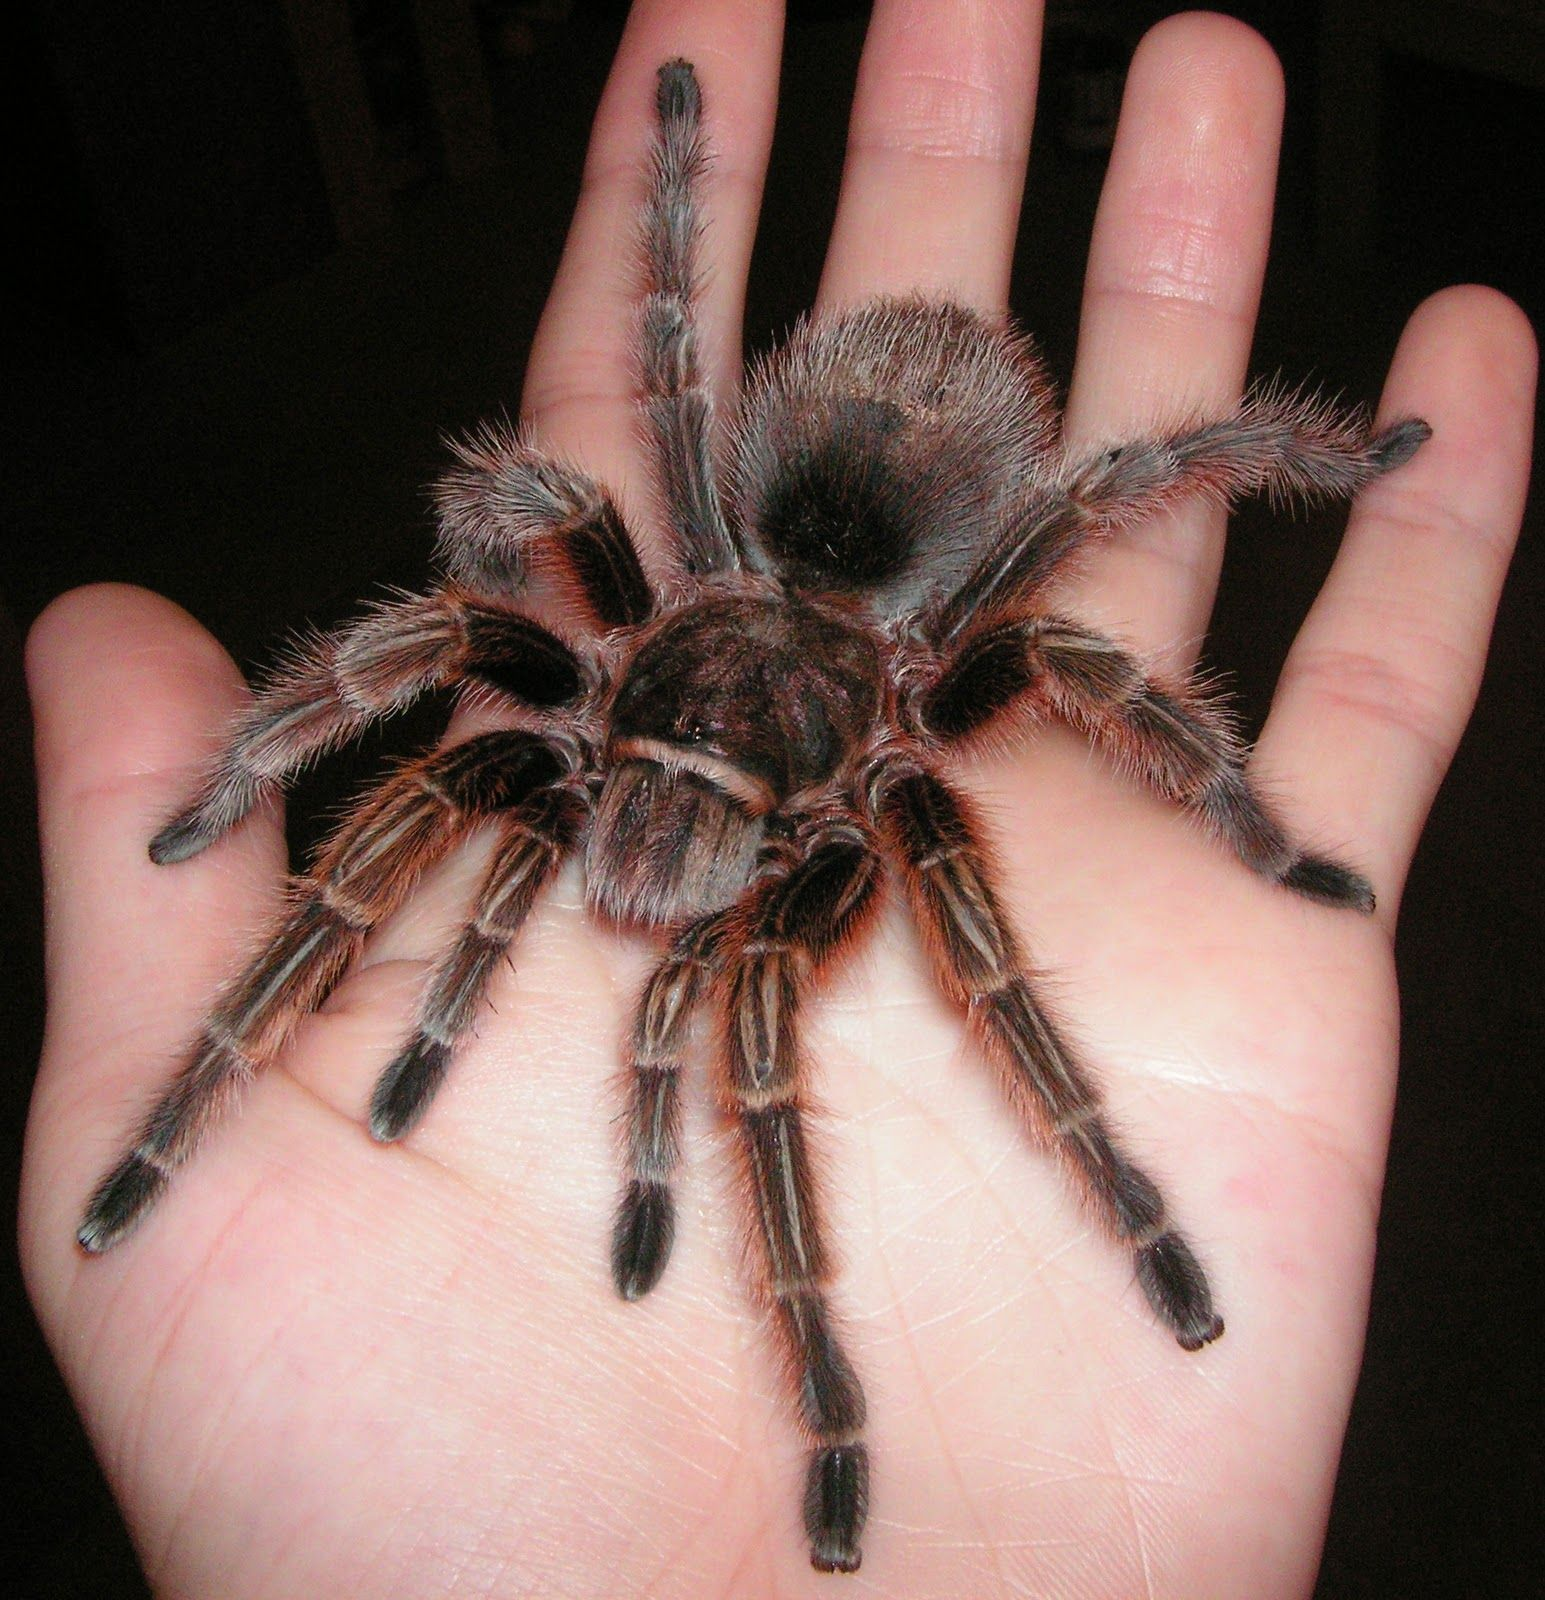 Worlds Most Amazing Things Giant Tarantula Spider